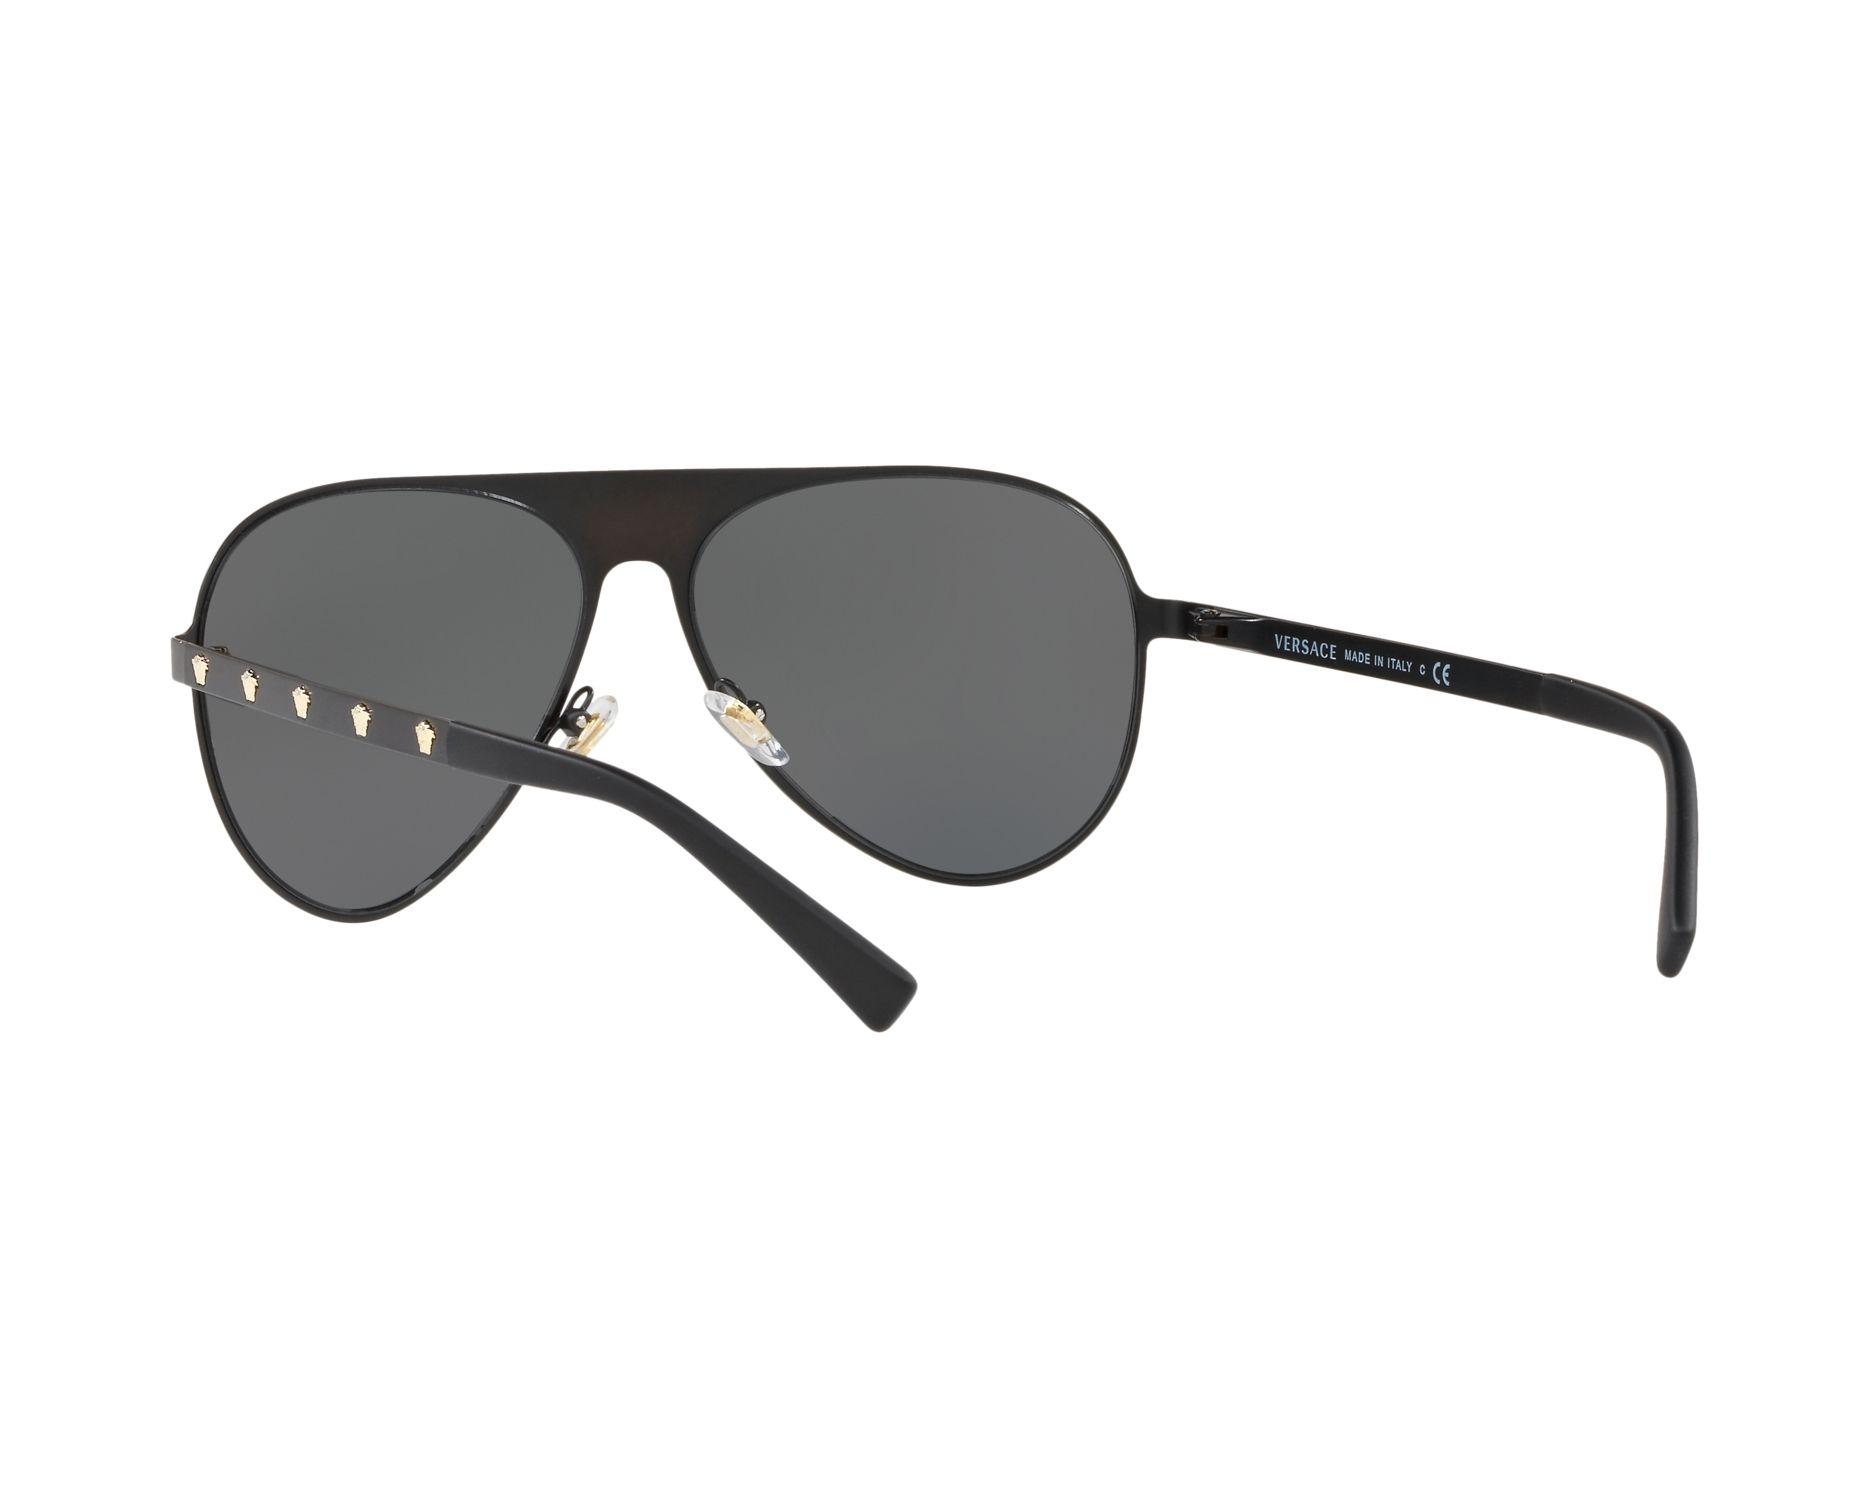 a624b252bb6 Sunglasses Versace VE-2189 142587 59-14 Black Gold 360 degree view 6